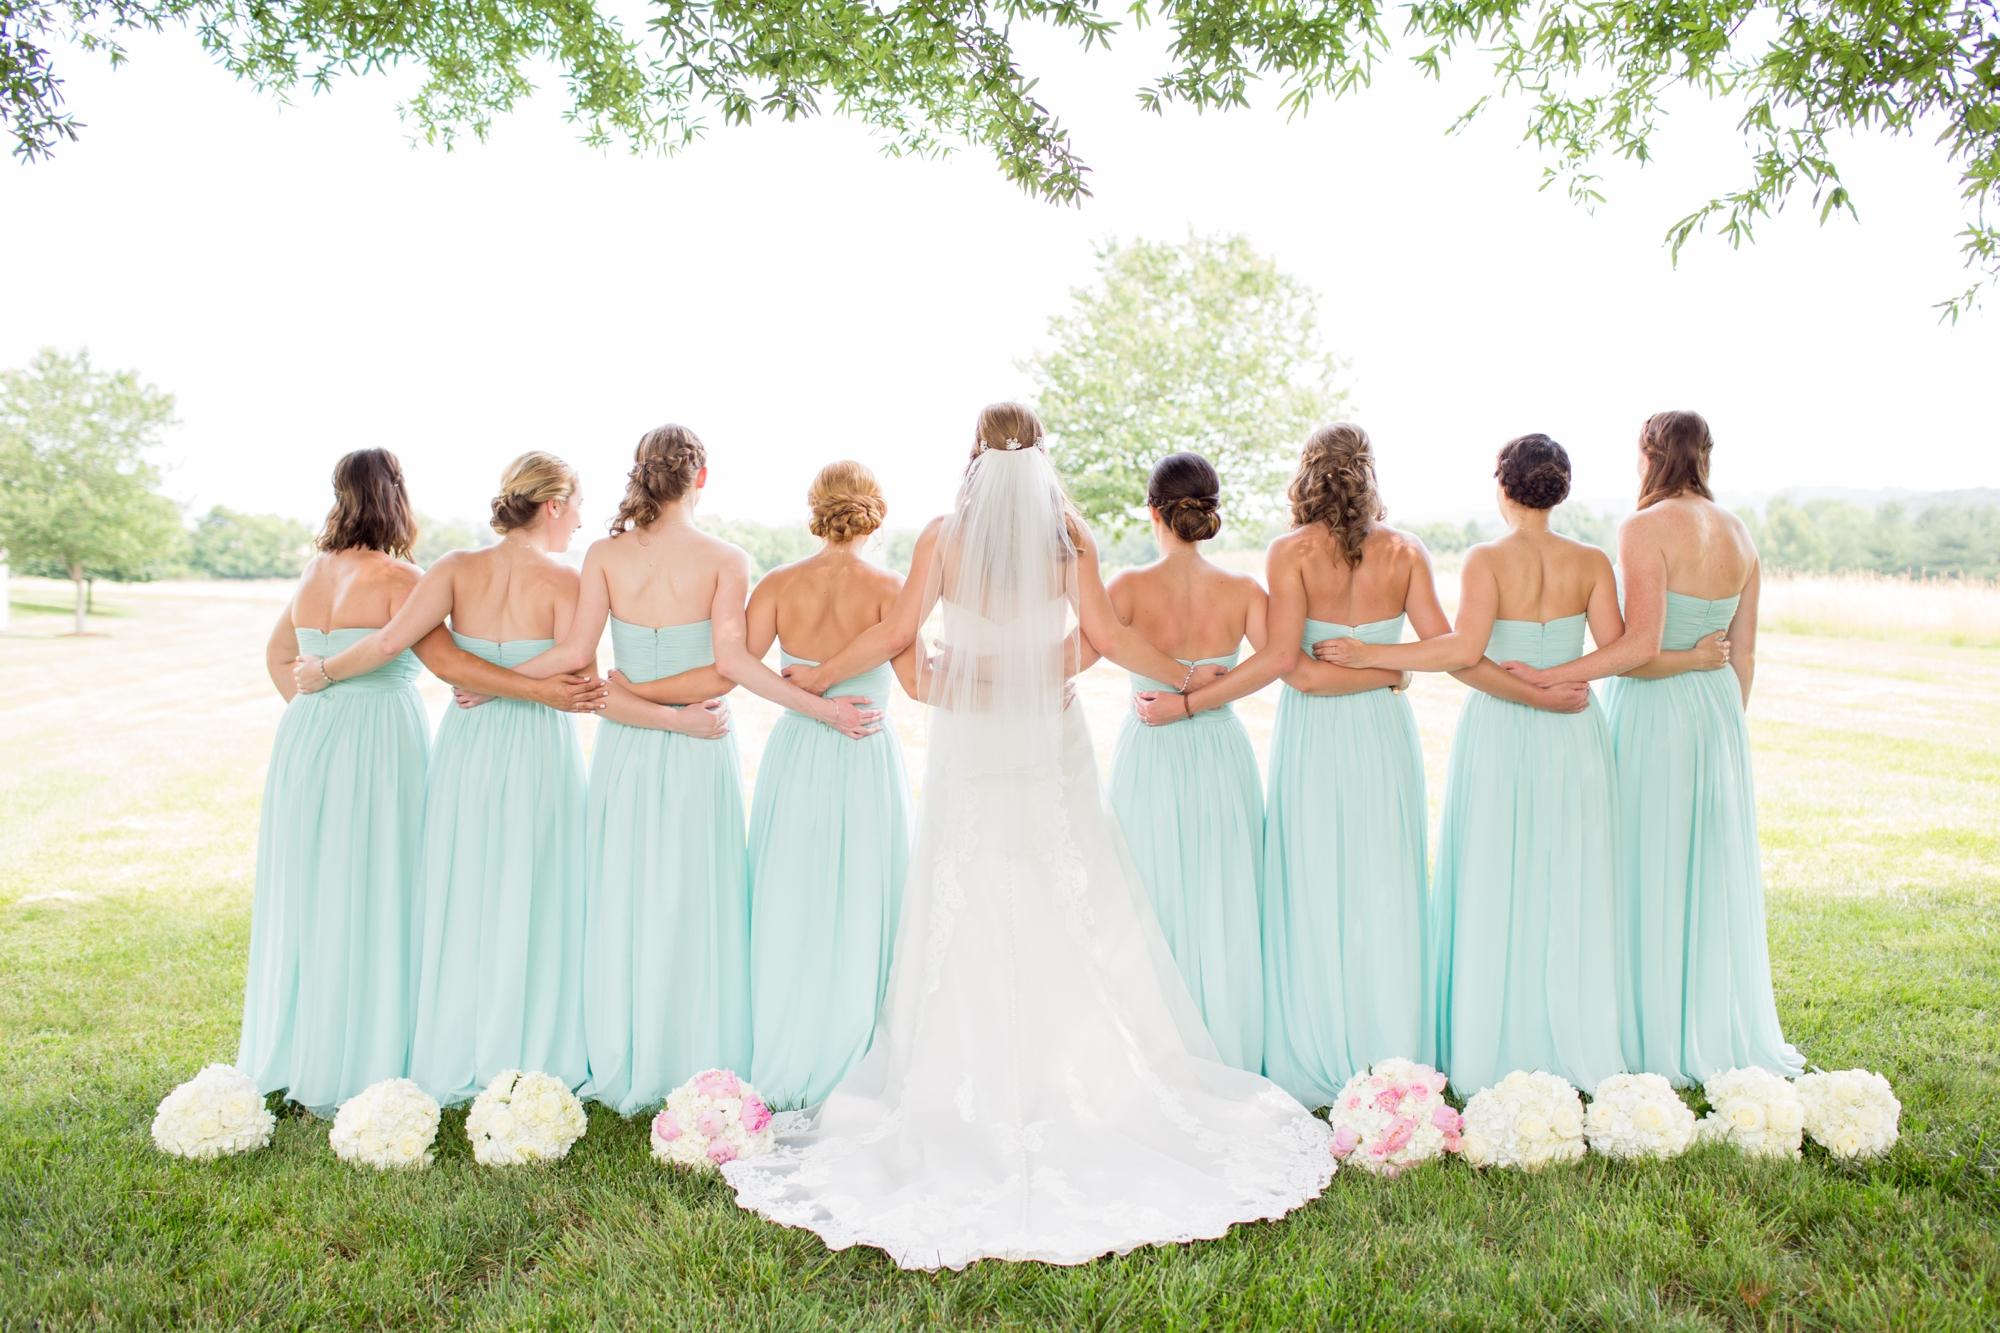 2-Banal Wedding Bridal Party-173_annagracephotography maryland wedding photographer country club of maryland.jpg